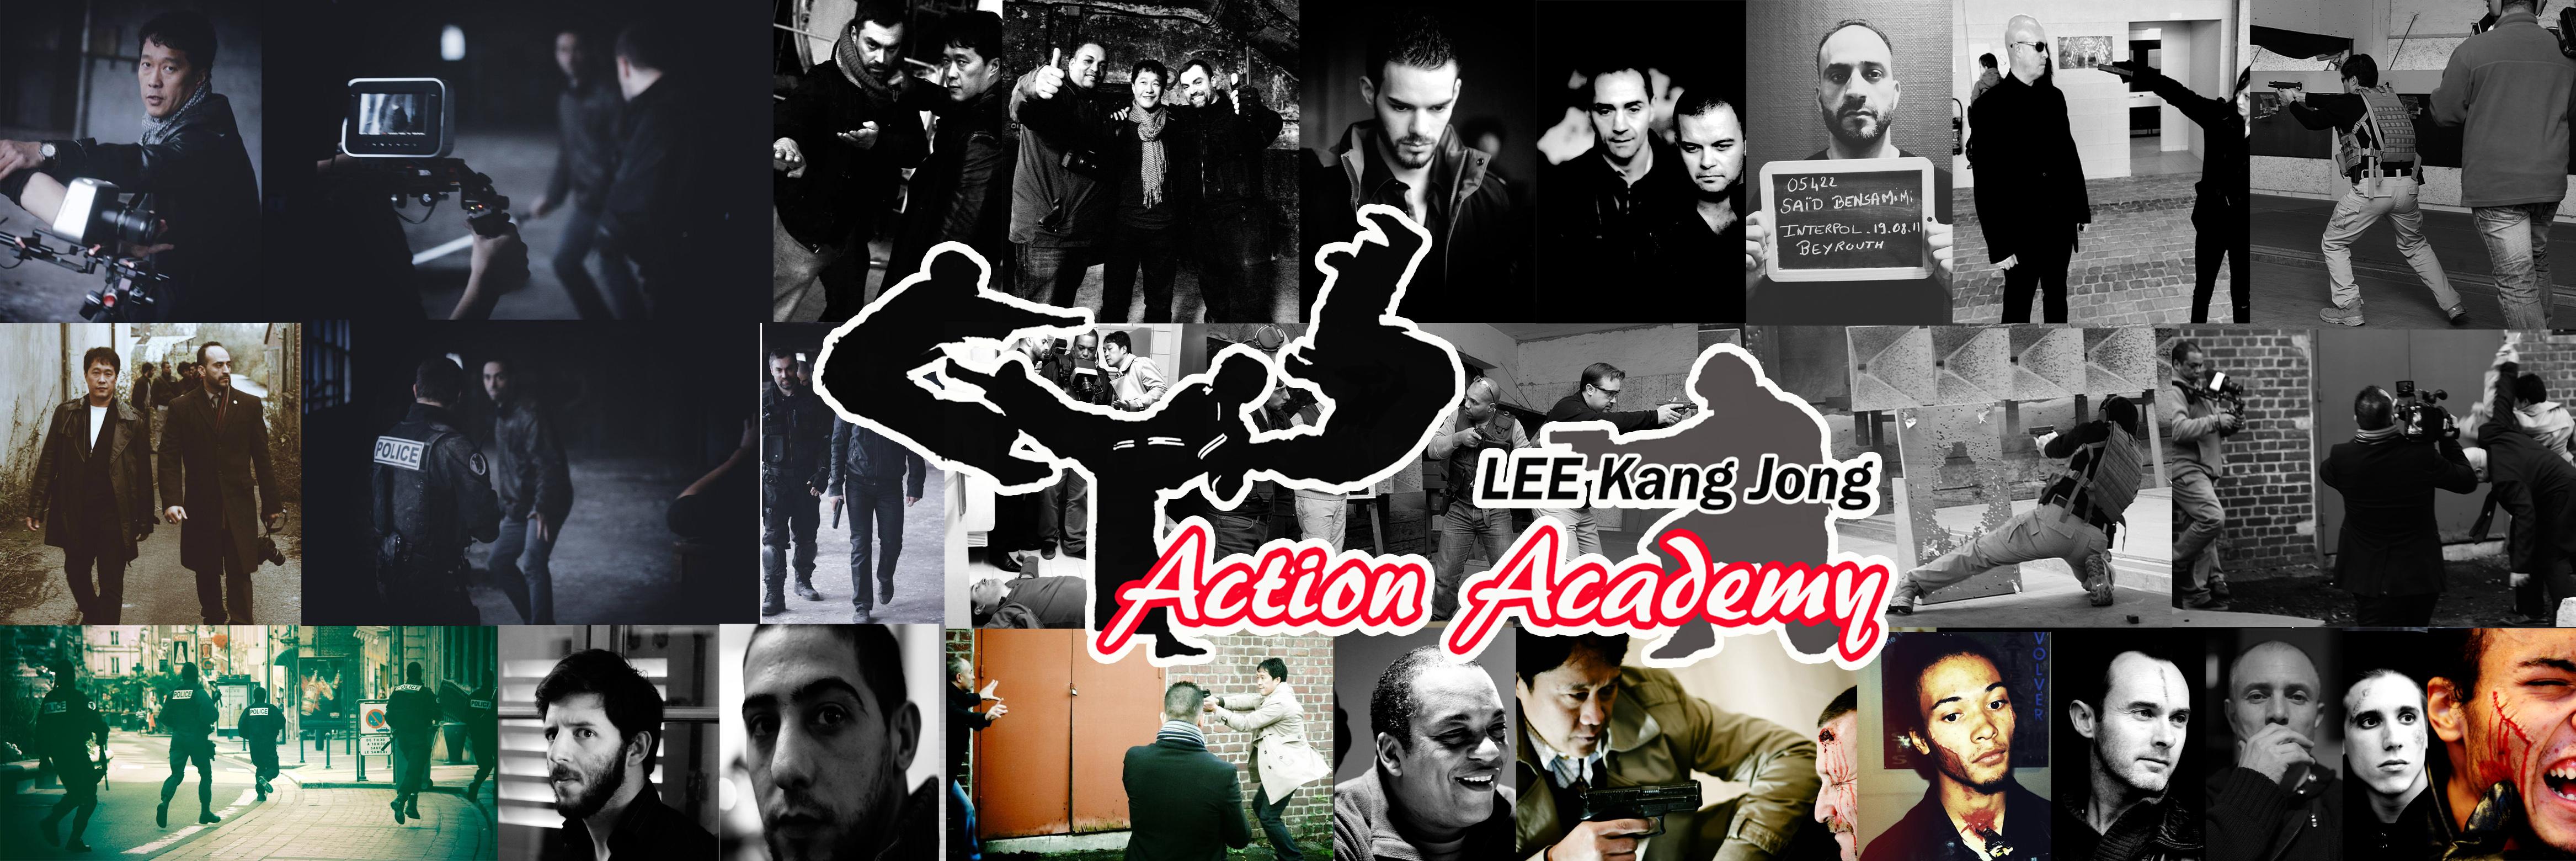 lkj-action